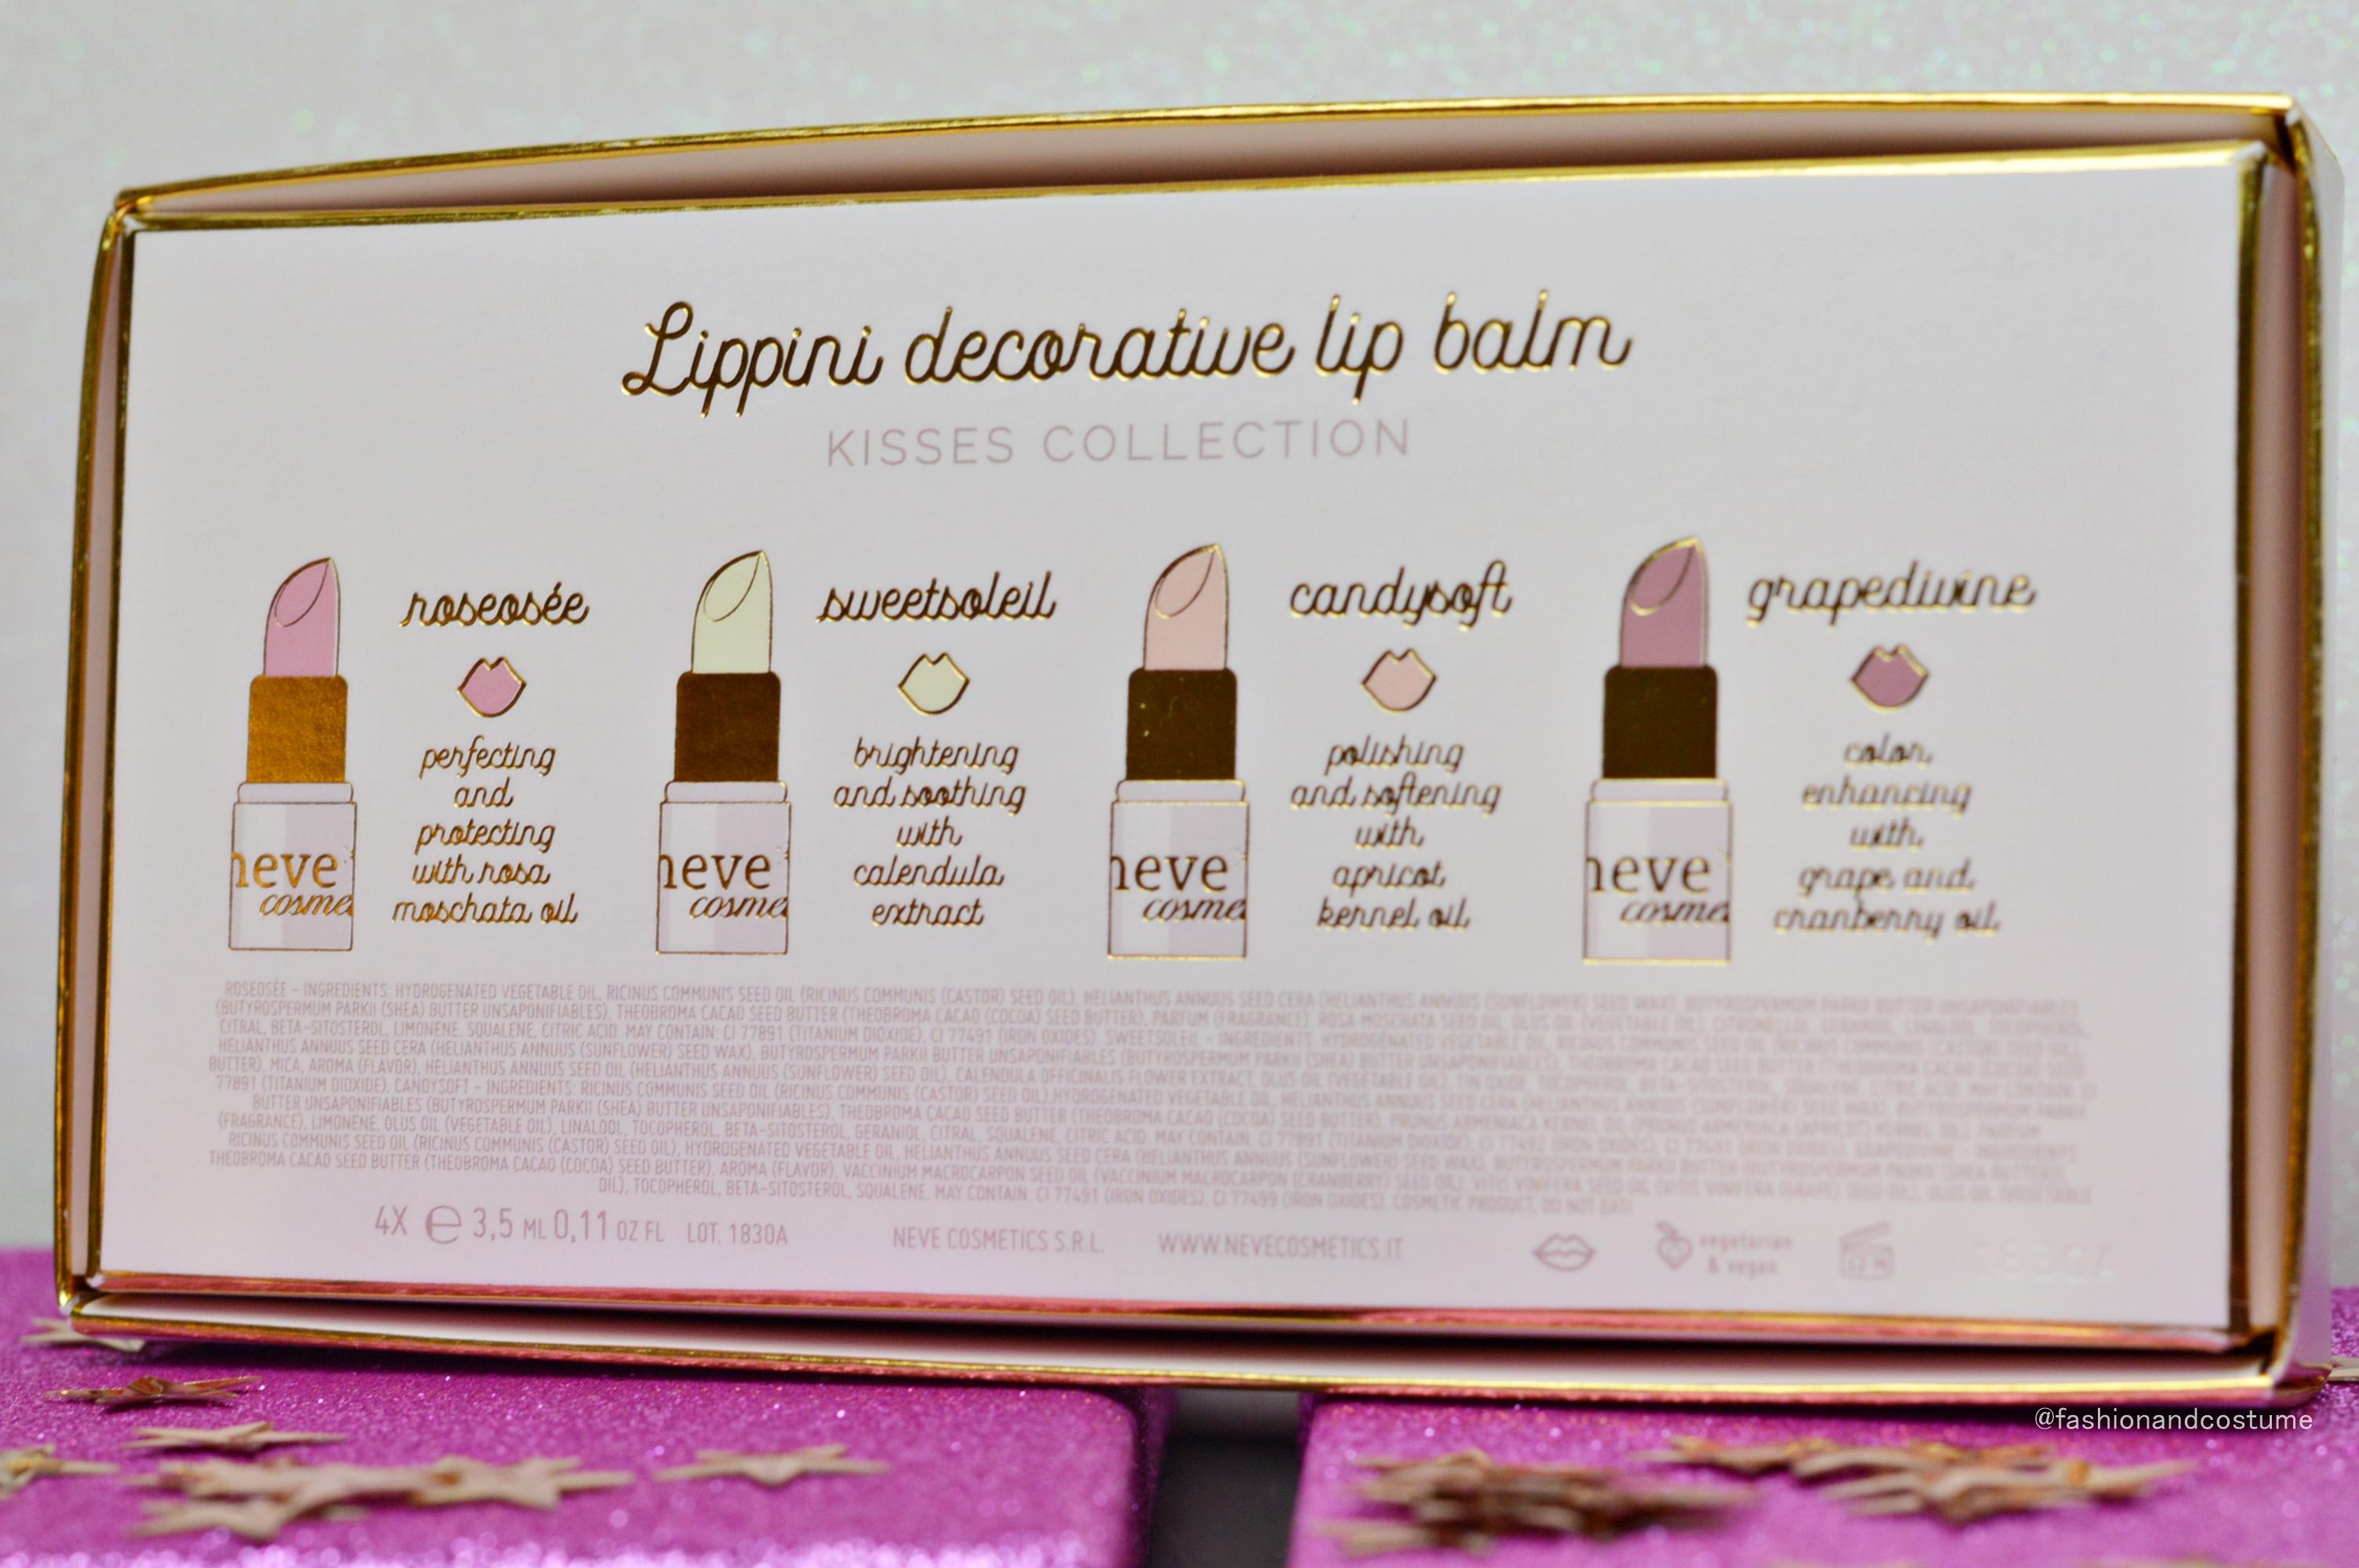 lippini-lipbalm-neve-cosmetics-naturale-labbra-idratate-idratare-roseosée-sweetsoleil-natale-promozione-candysoft-grapedivine